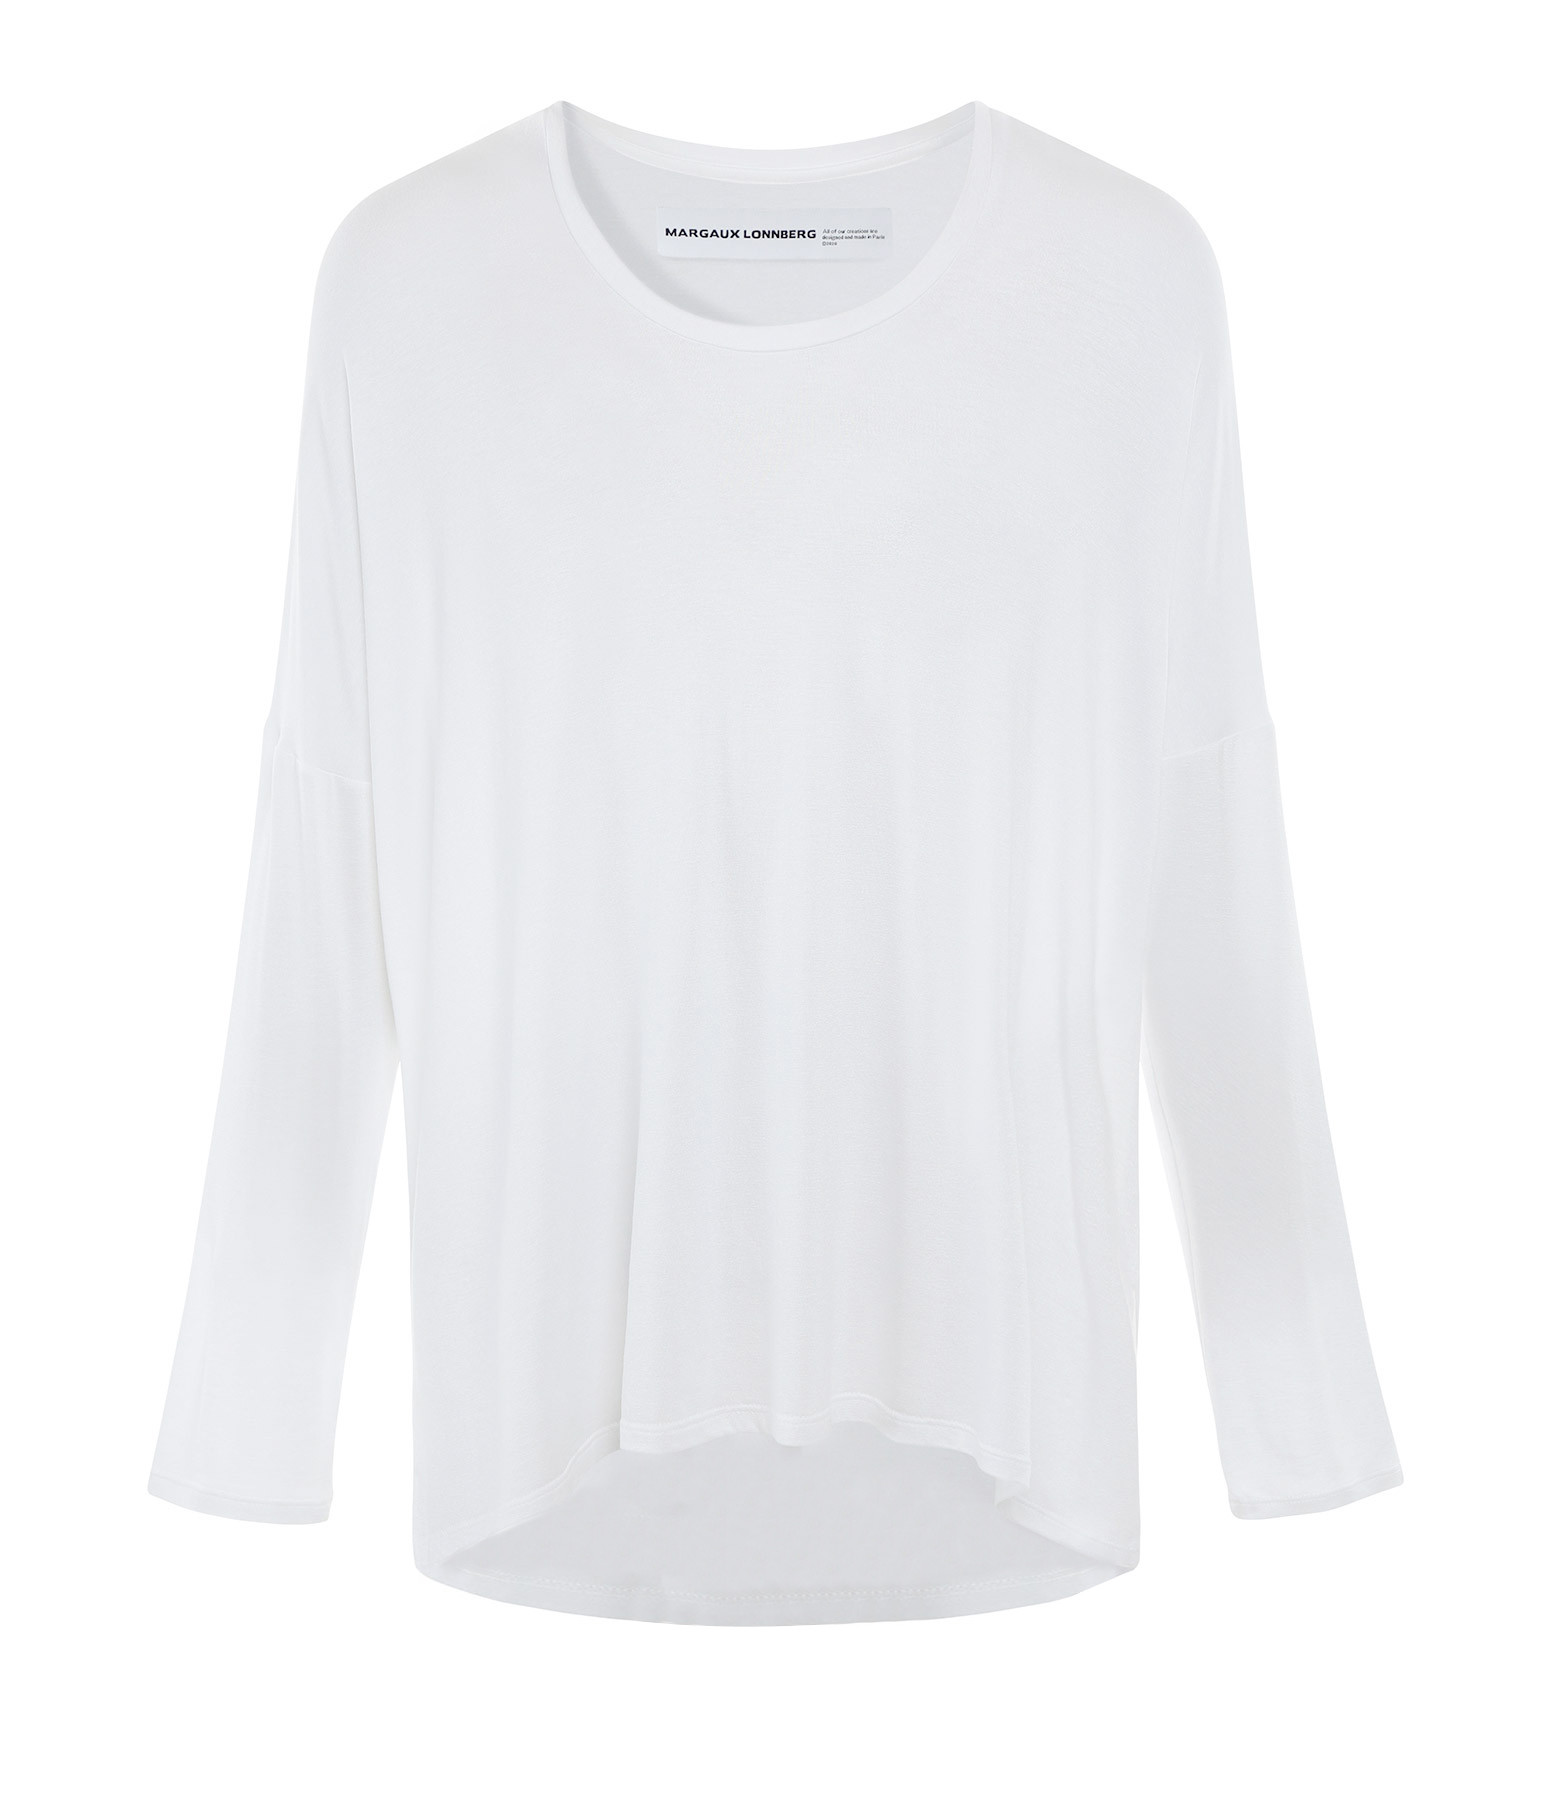 MARGAUX LONNBERG - Tee-shirt Ines Coton Blanc